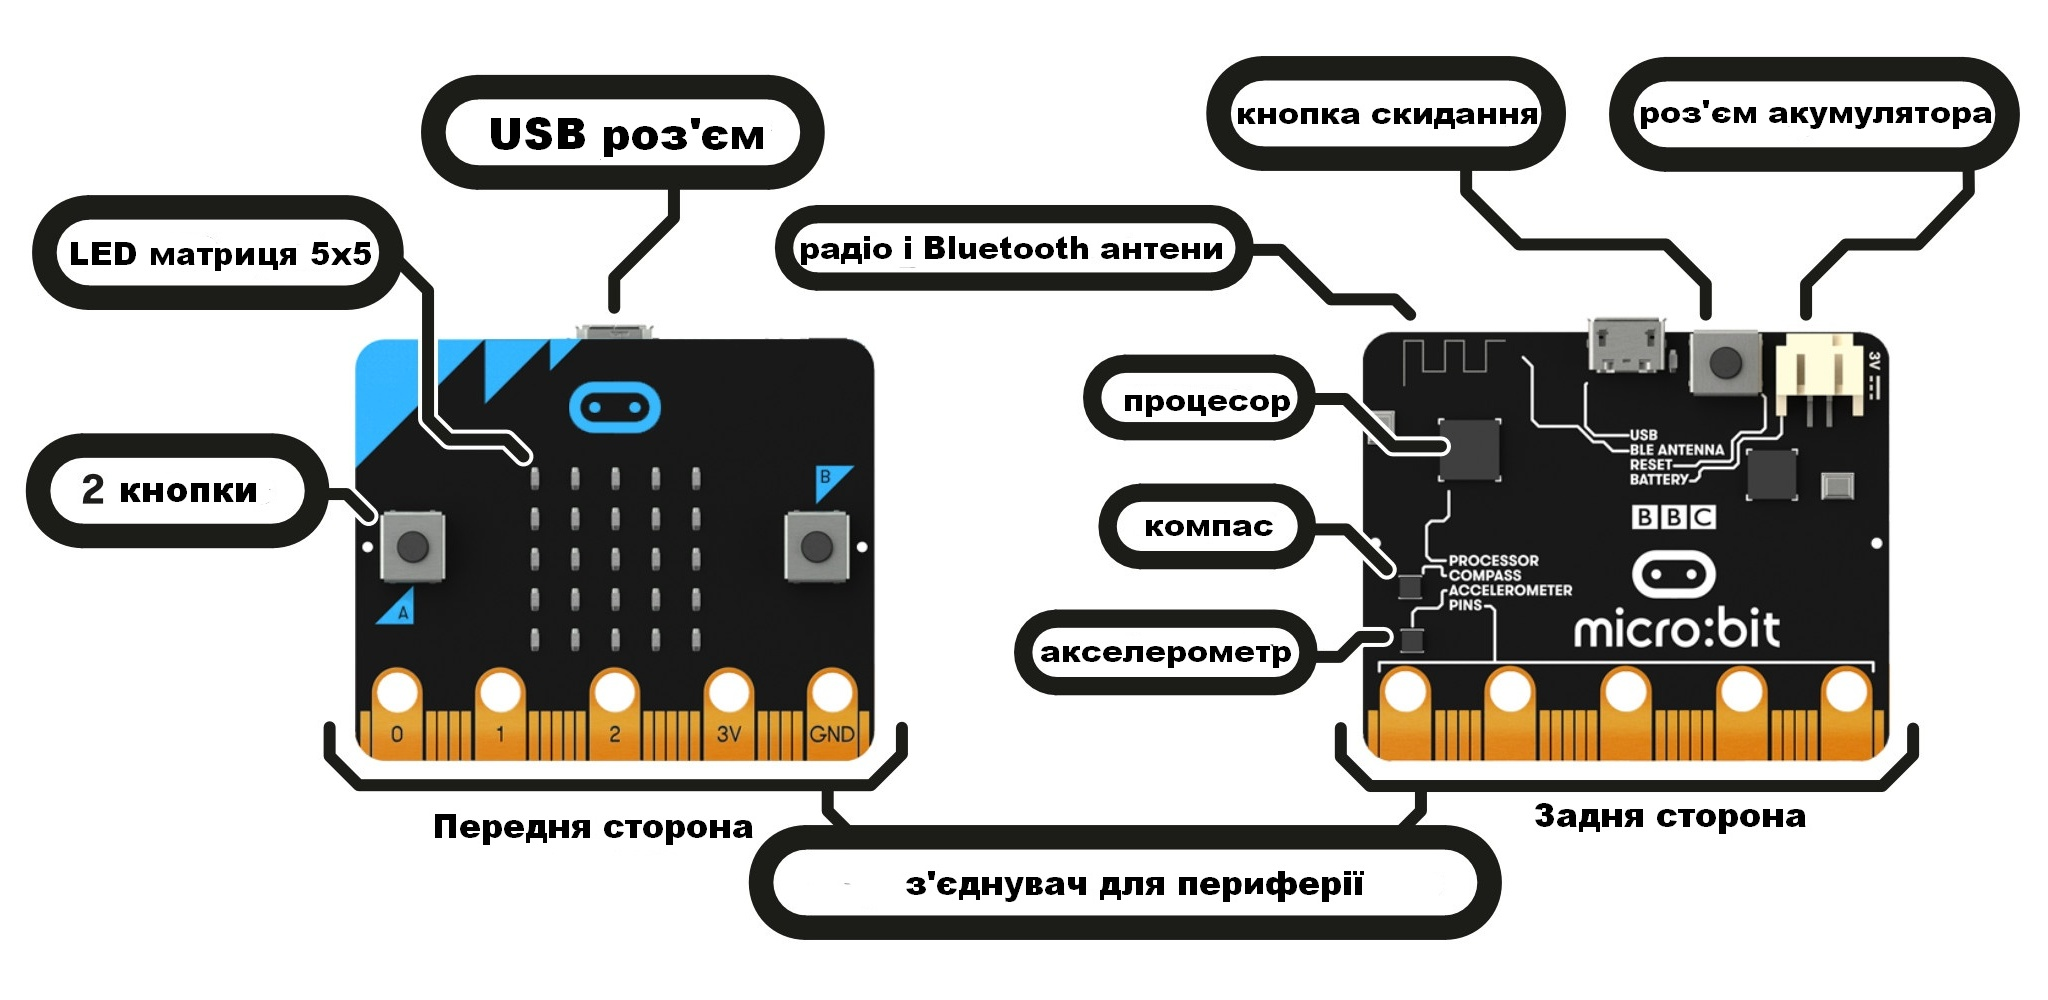 Micro:bit hardware